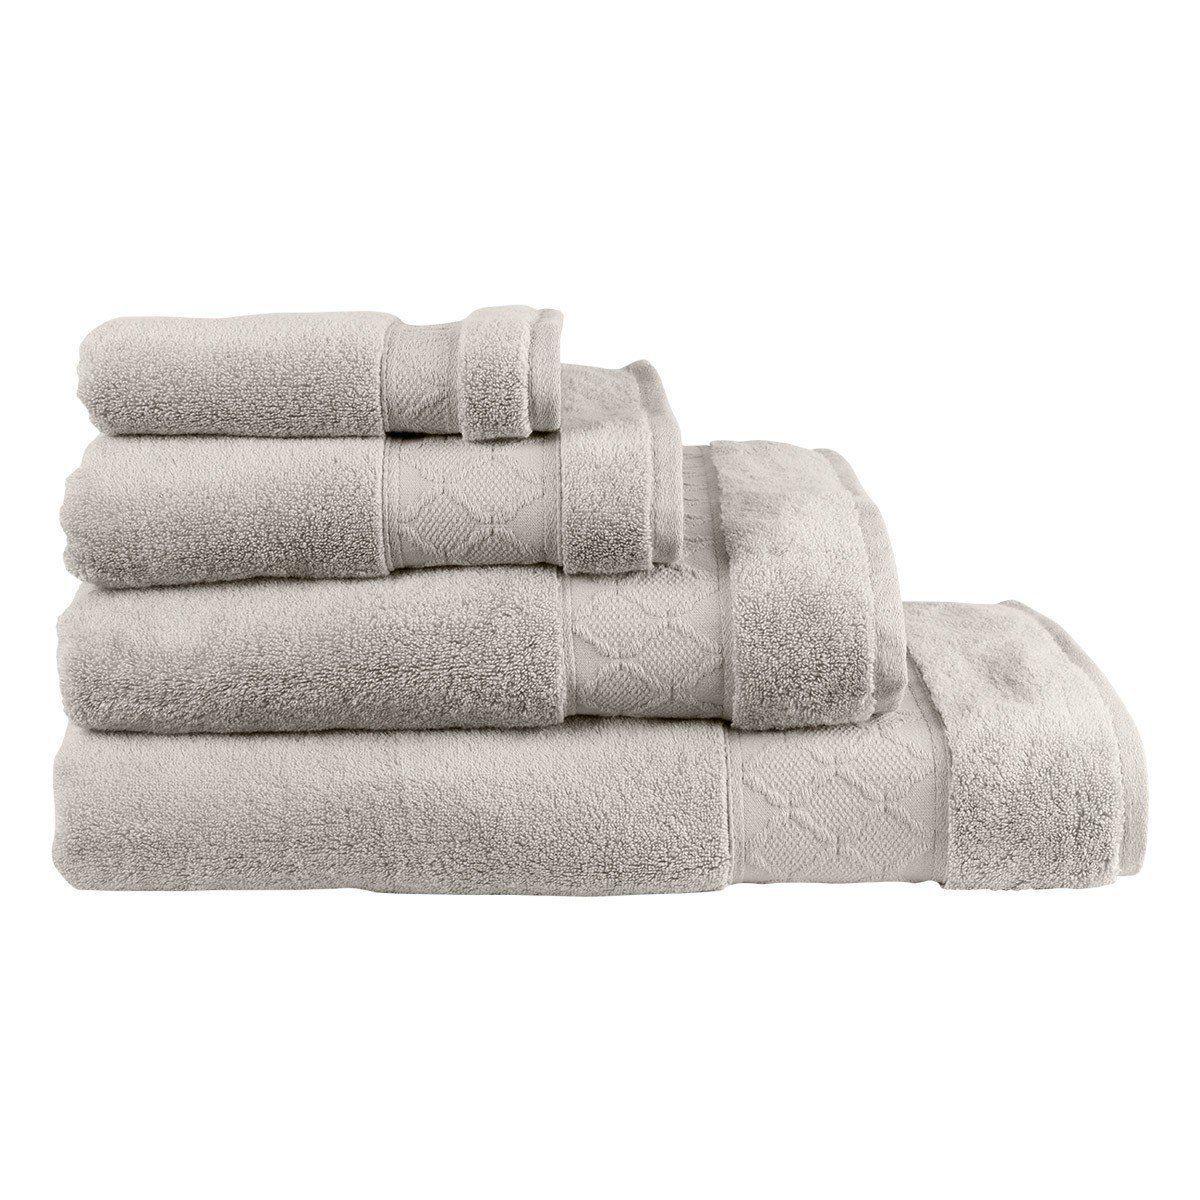 Caresse Linen Bath Collection Towel Set Pink Towels Towel